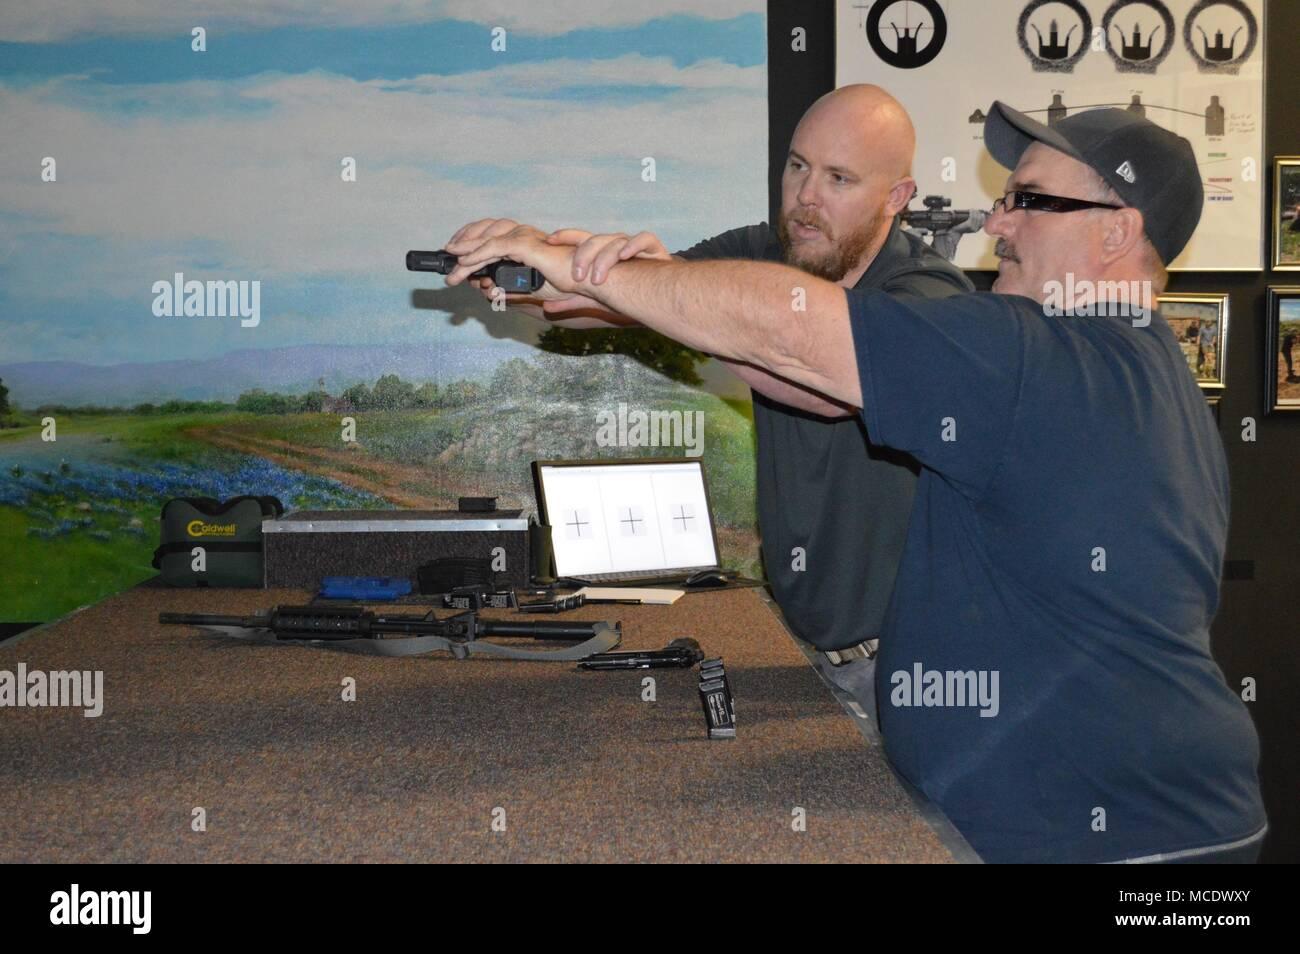 Shooting Stance Stock Photos Amp Shooting Stance Stock